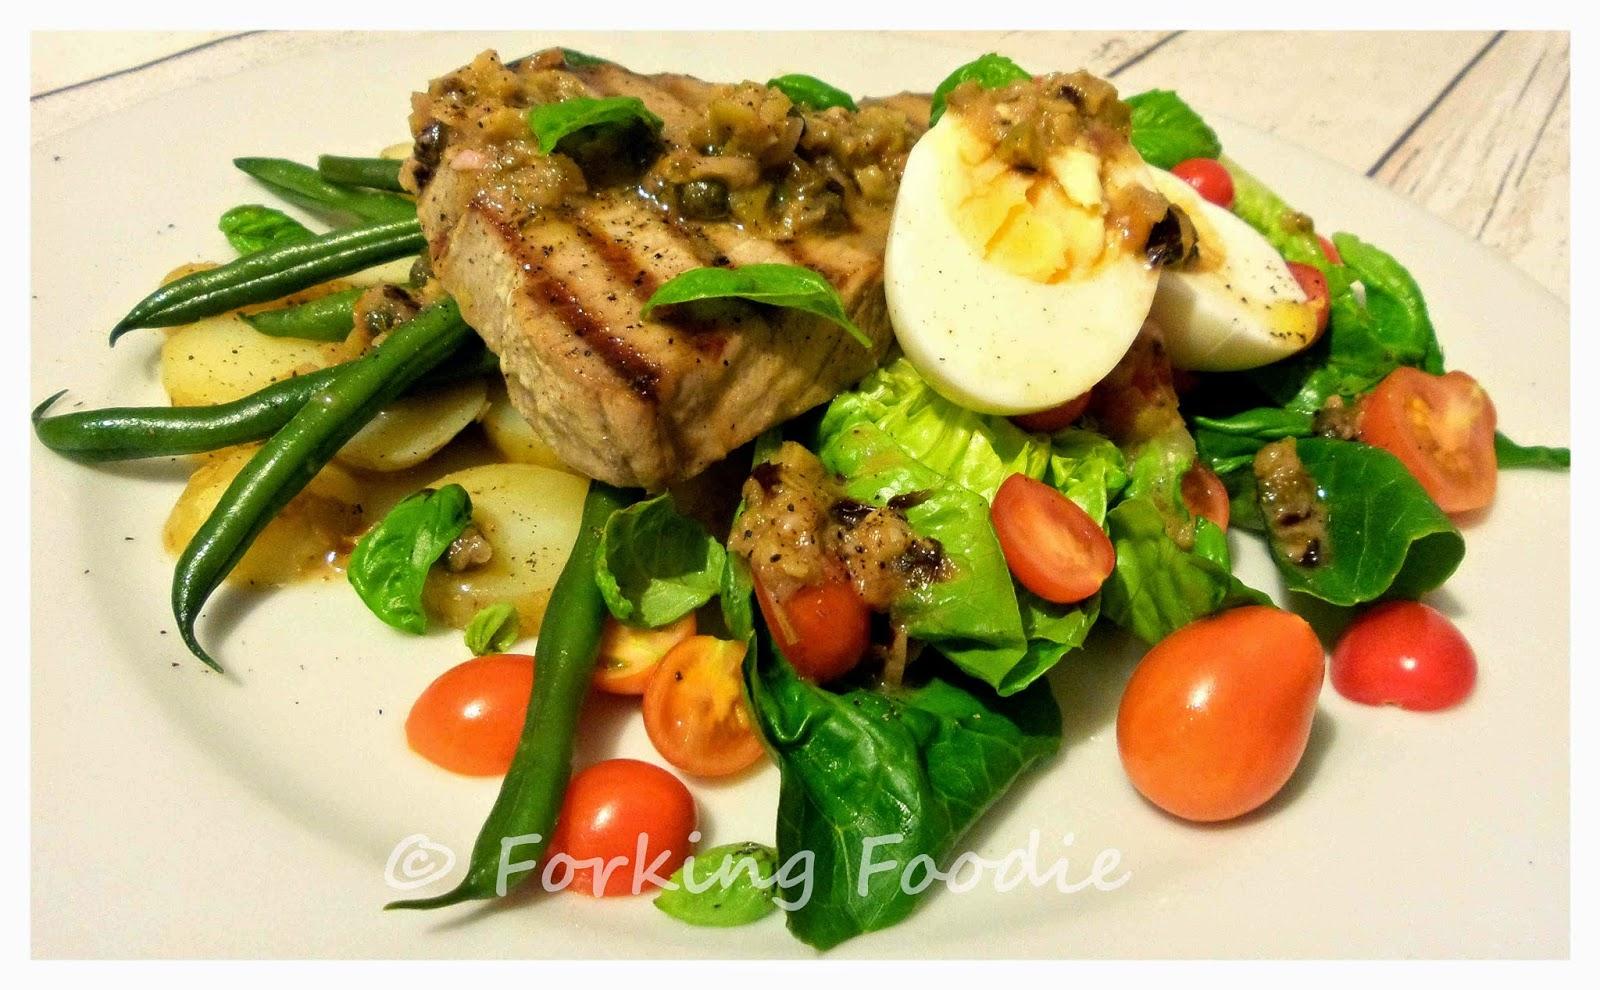 Forking Foodie: Seared Tuna Nicoise Salad (includes ...